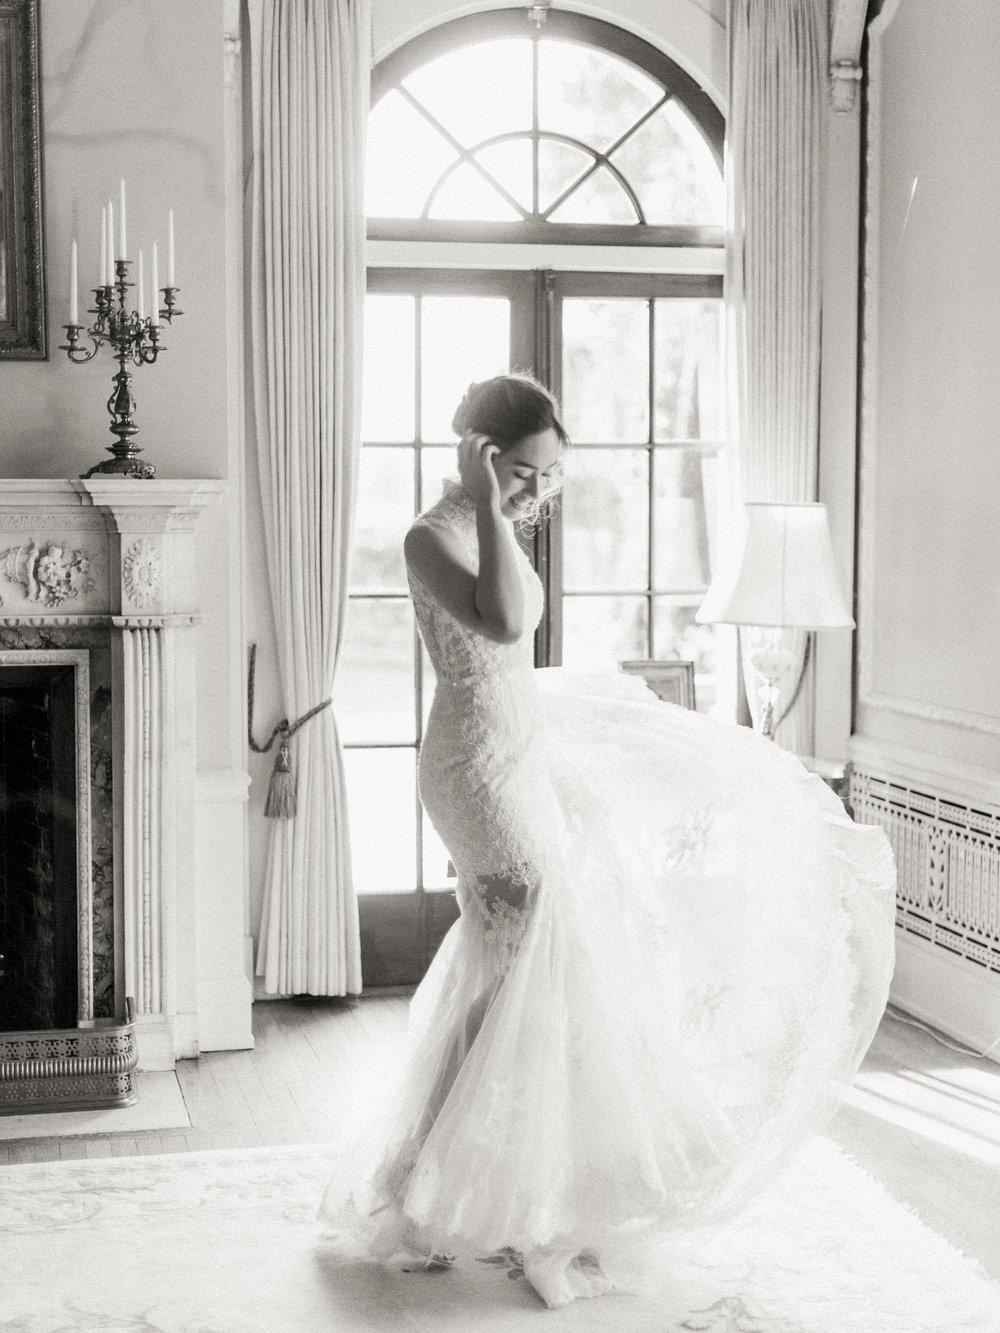 Vancouver wedding photographer, Hycroft Manor wedding